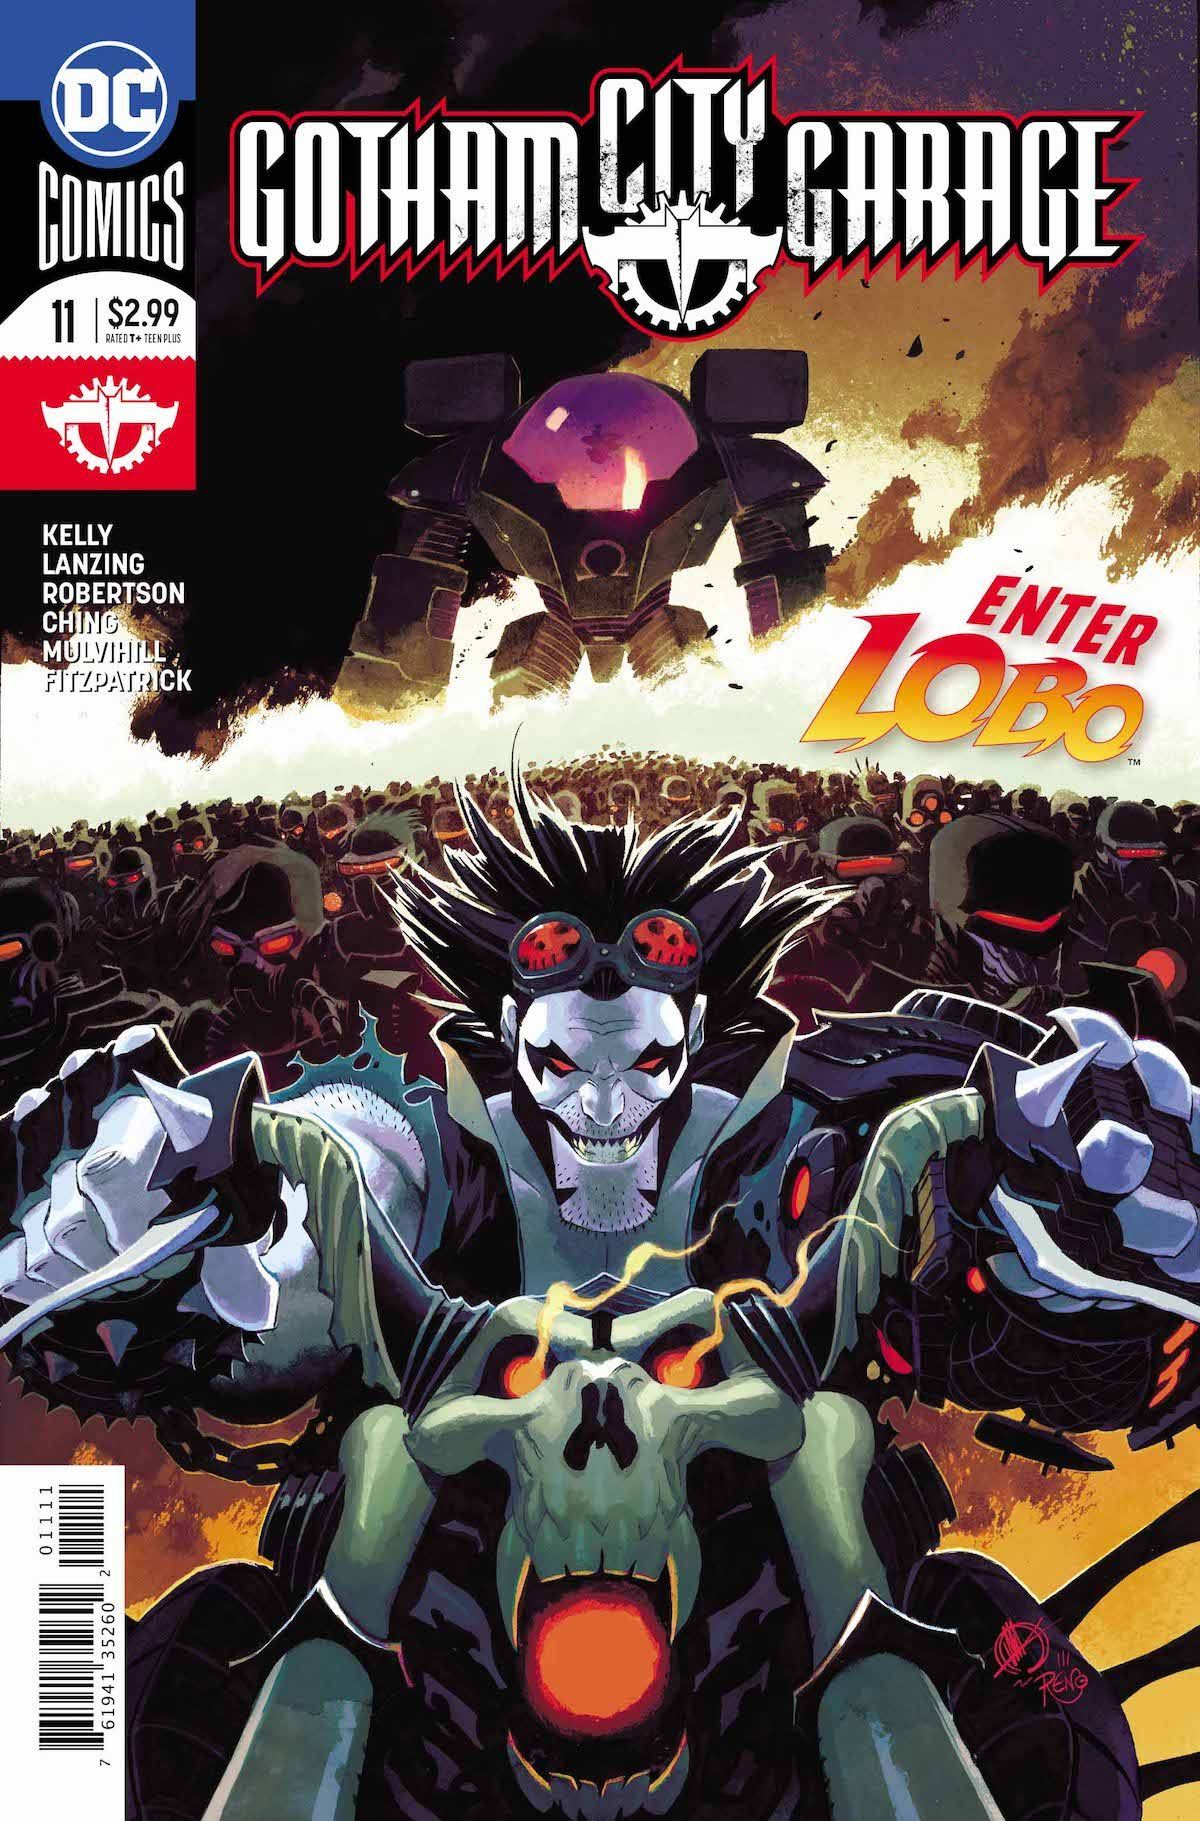 Gotham City Garage #11 cover